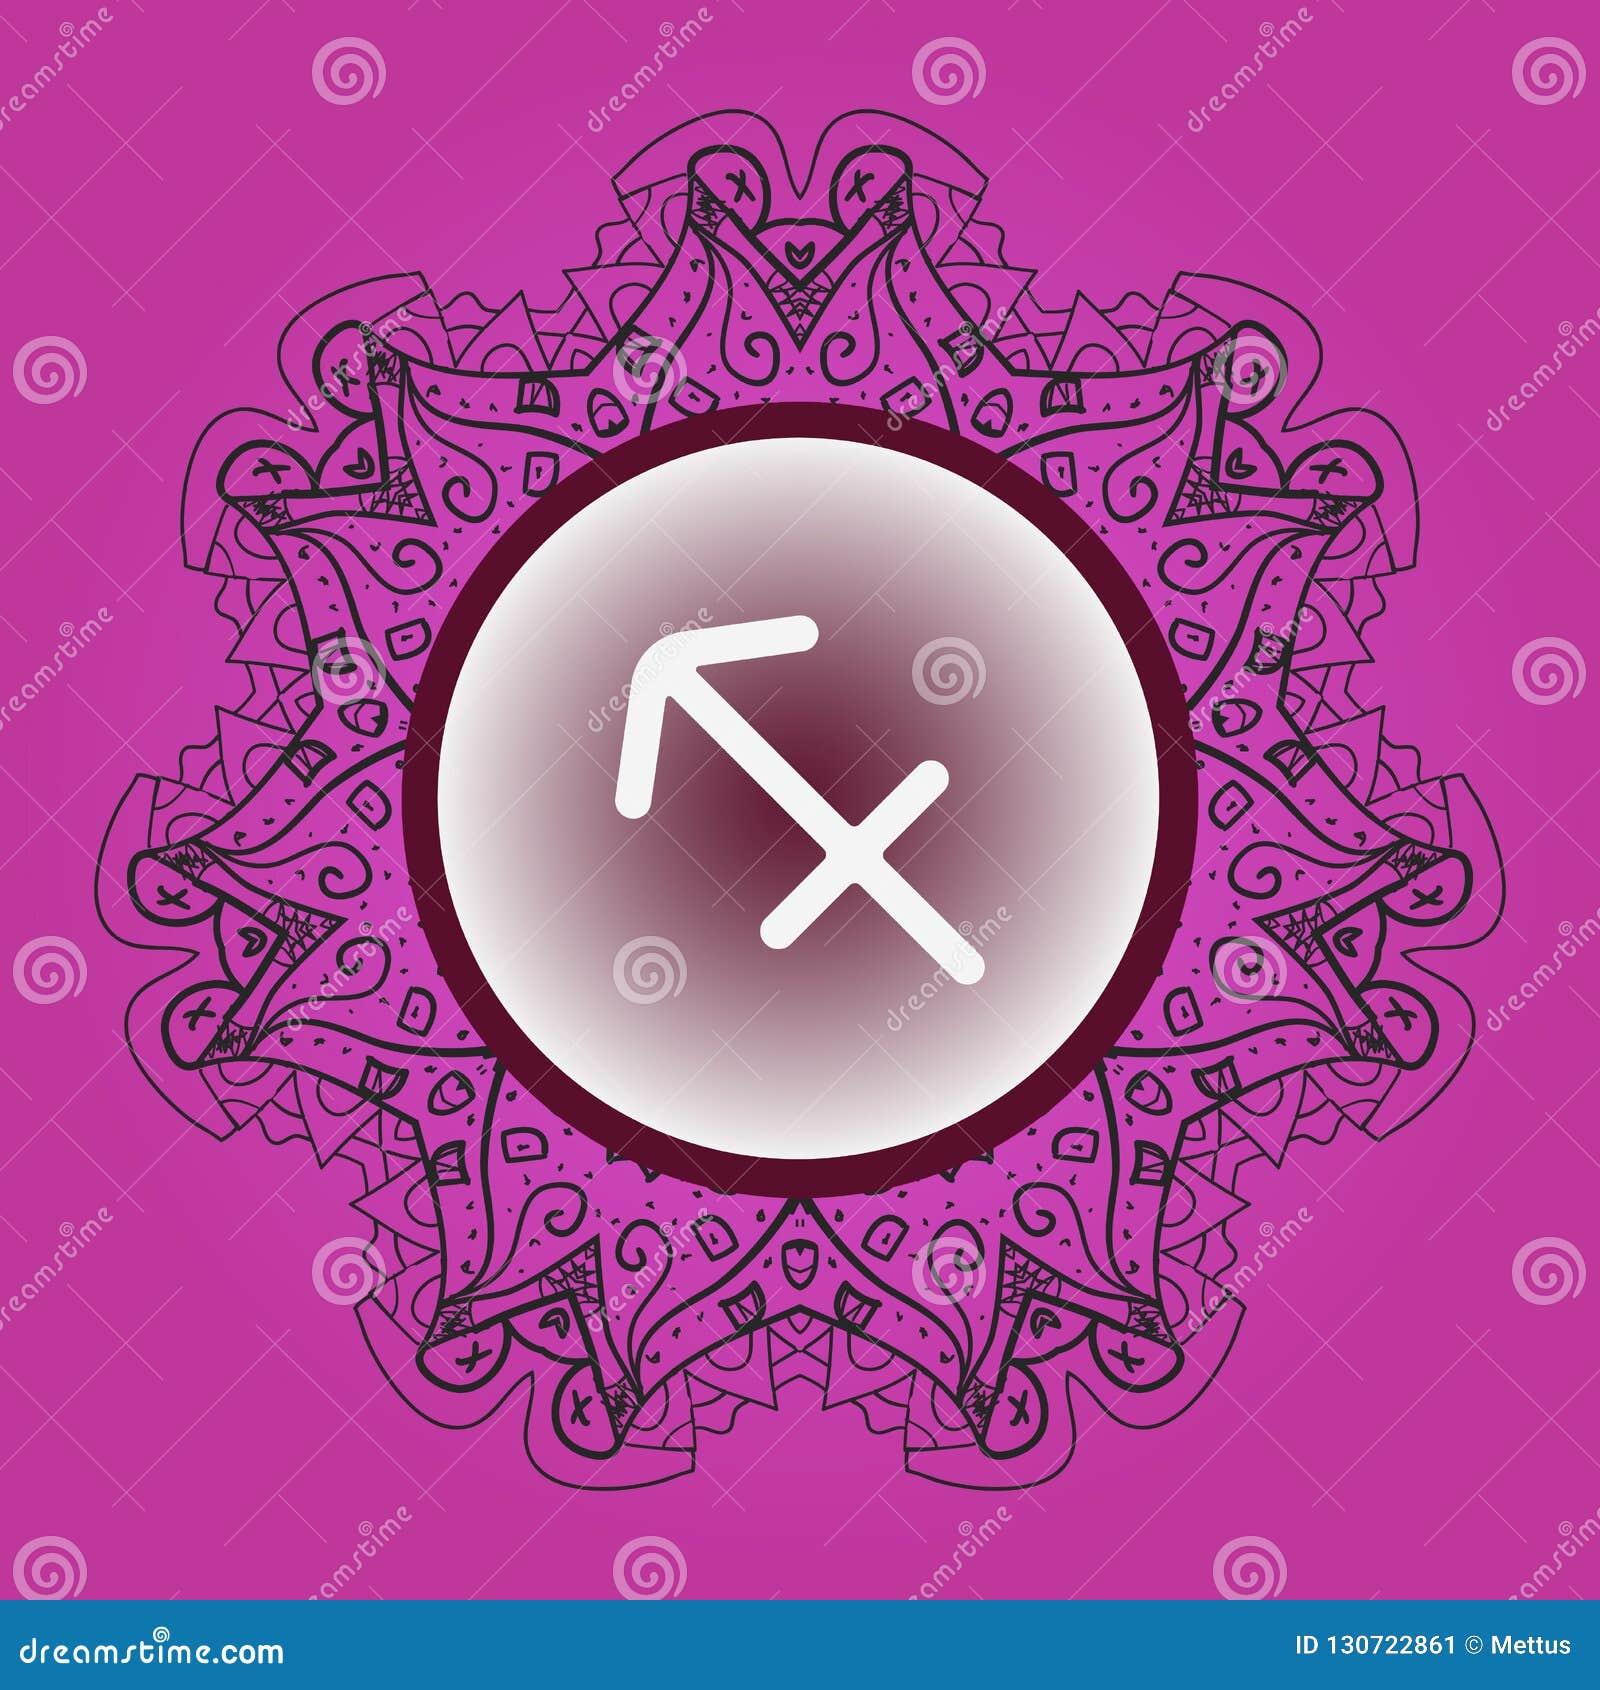 zodiac sign wallpaper